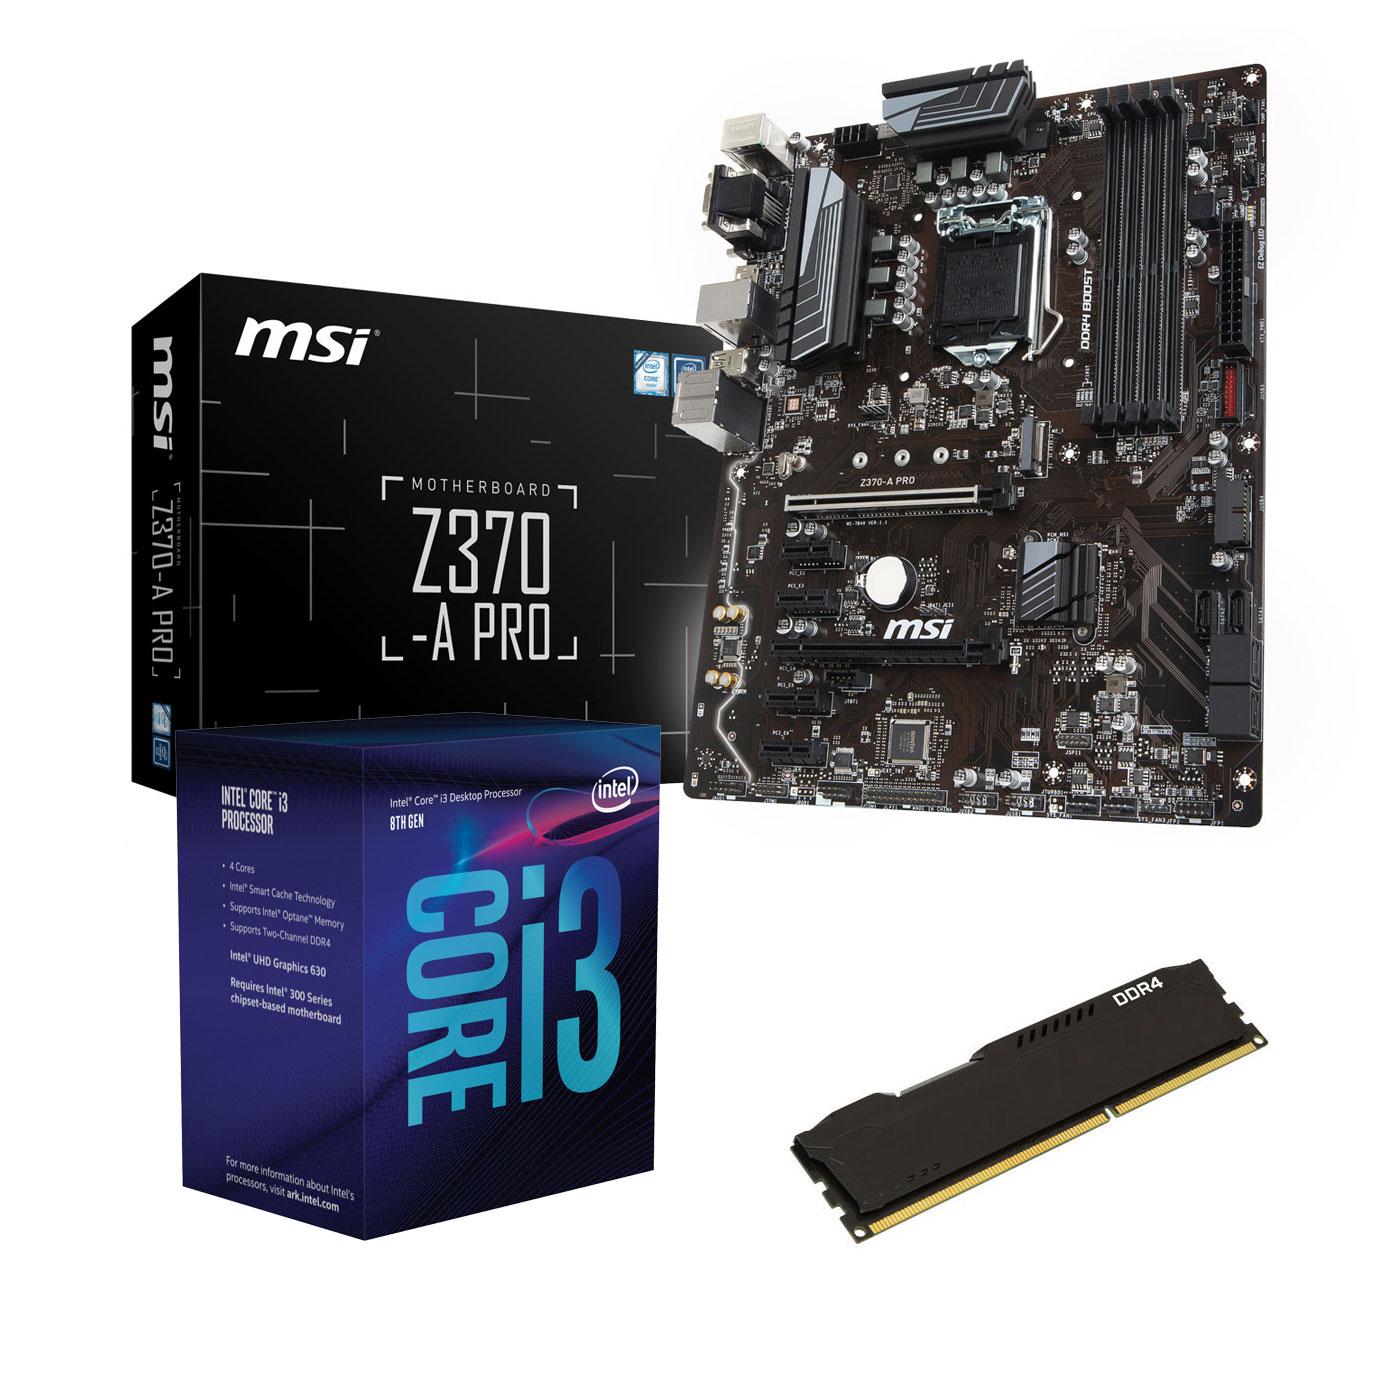 Kit upgrade PC Kit Upgrade PC Core i3 MSI Z370-A PRO 4 Go Carte mère Socket 1151 Intel Z370 Express + CPU Intel Core i3-8100 (3.6 GHz) + RAM 4 Go DDR4